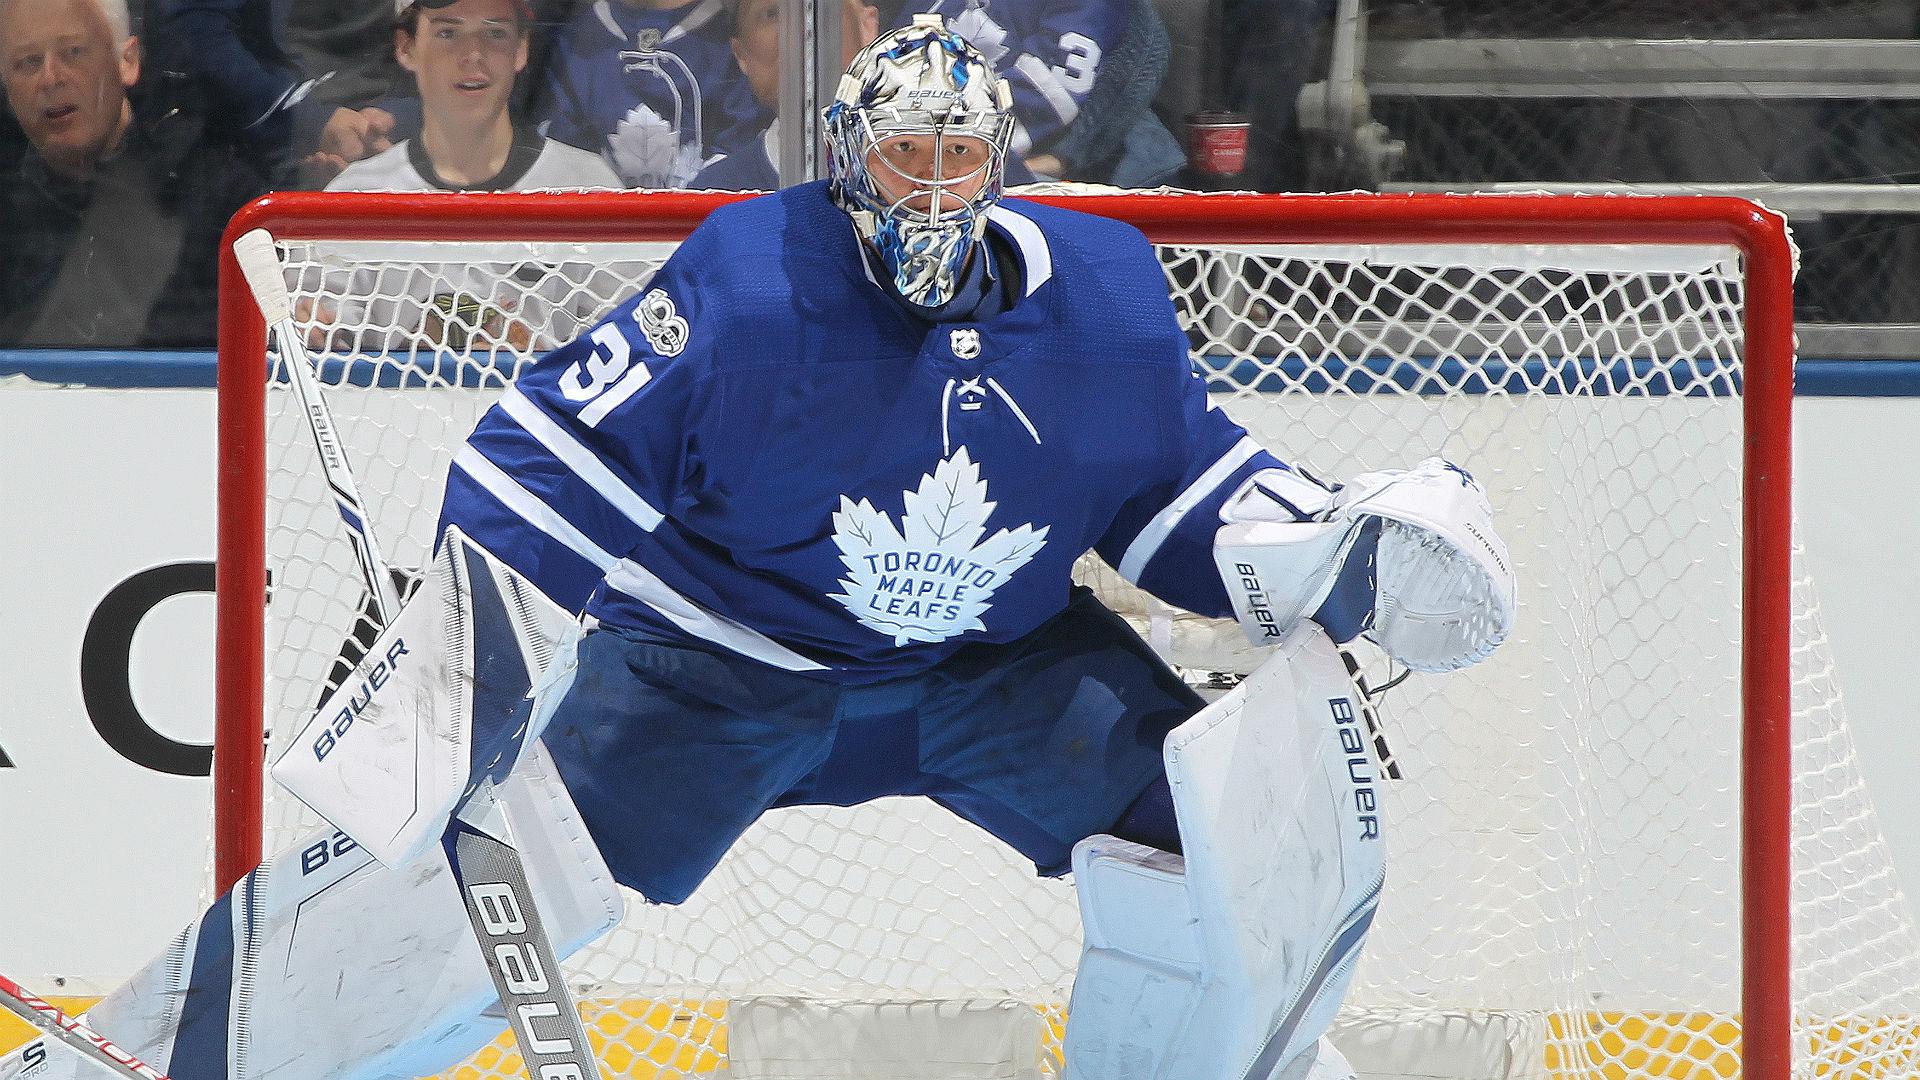 Andersen Wins 38th A New Maple Leafs Single Season Record Sporting News Canada